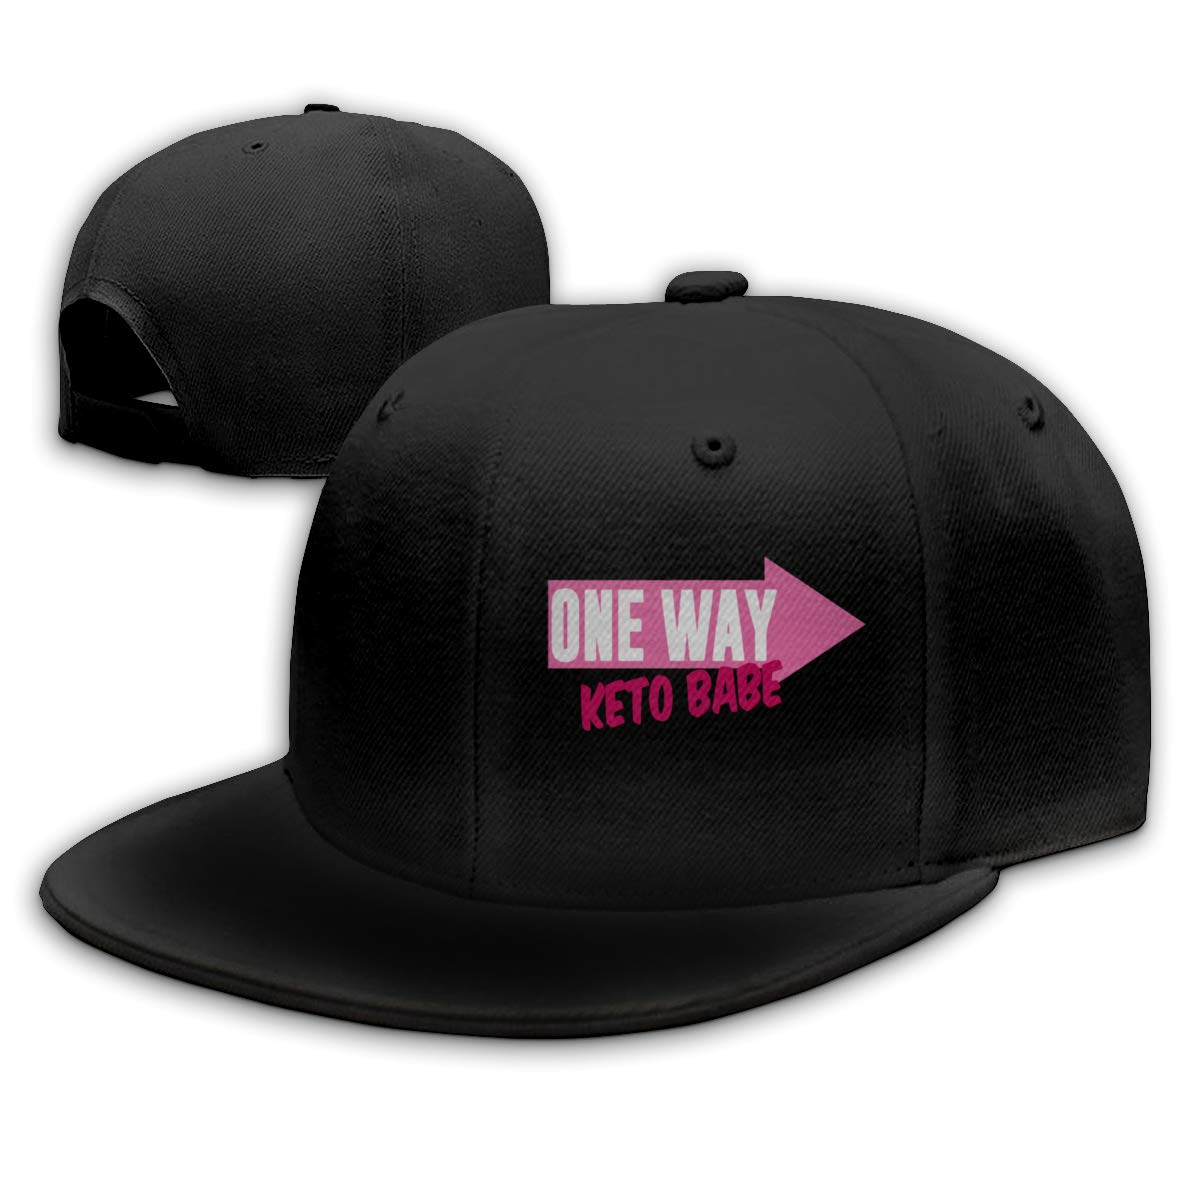 One Way Keto Babe Adjustable Flat Bill Baseball Caps Men Black